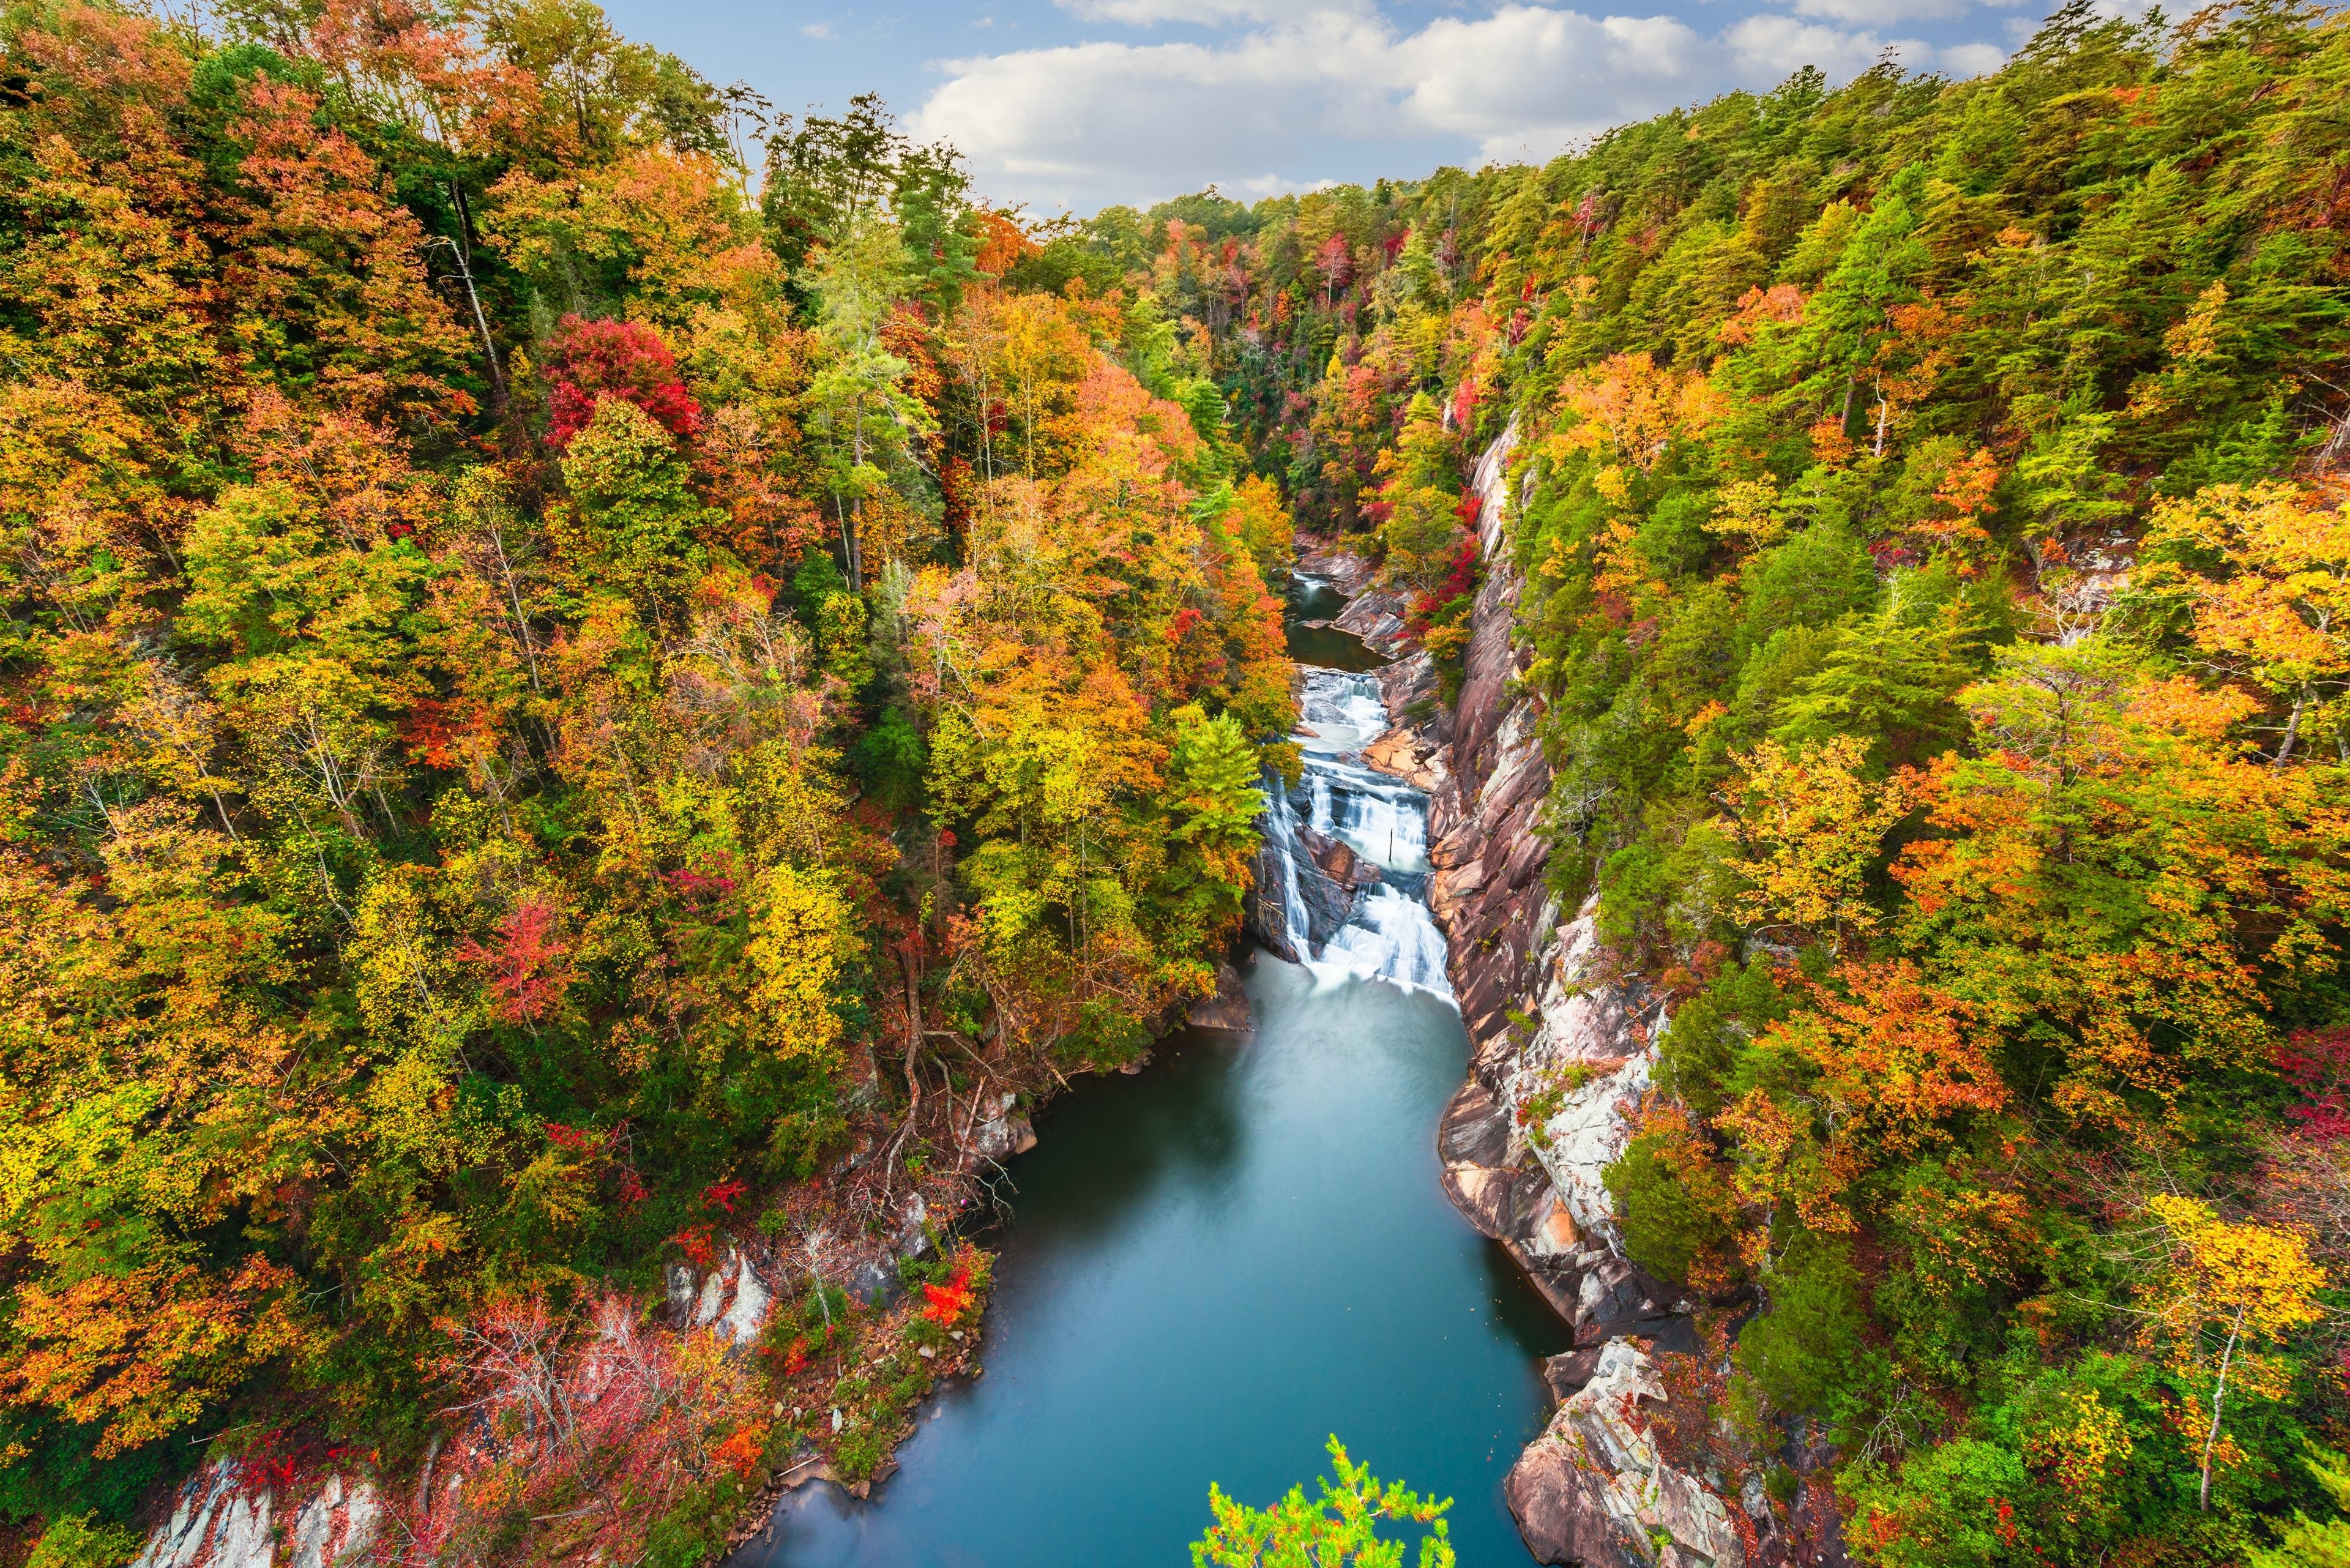 Fannin County, Georgia, United States of America